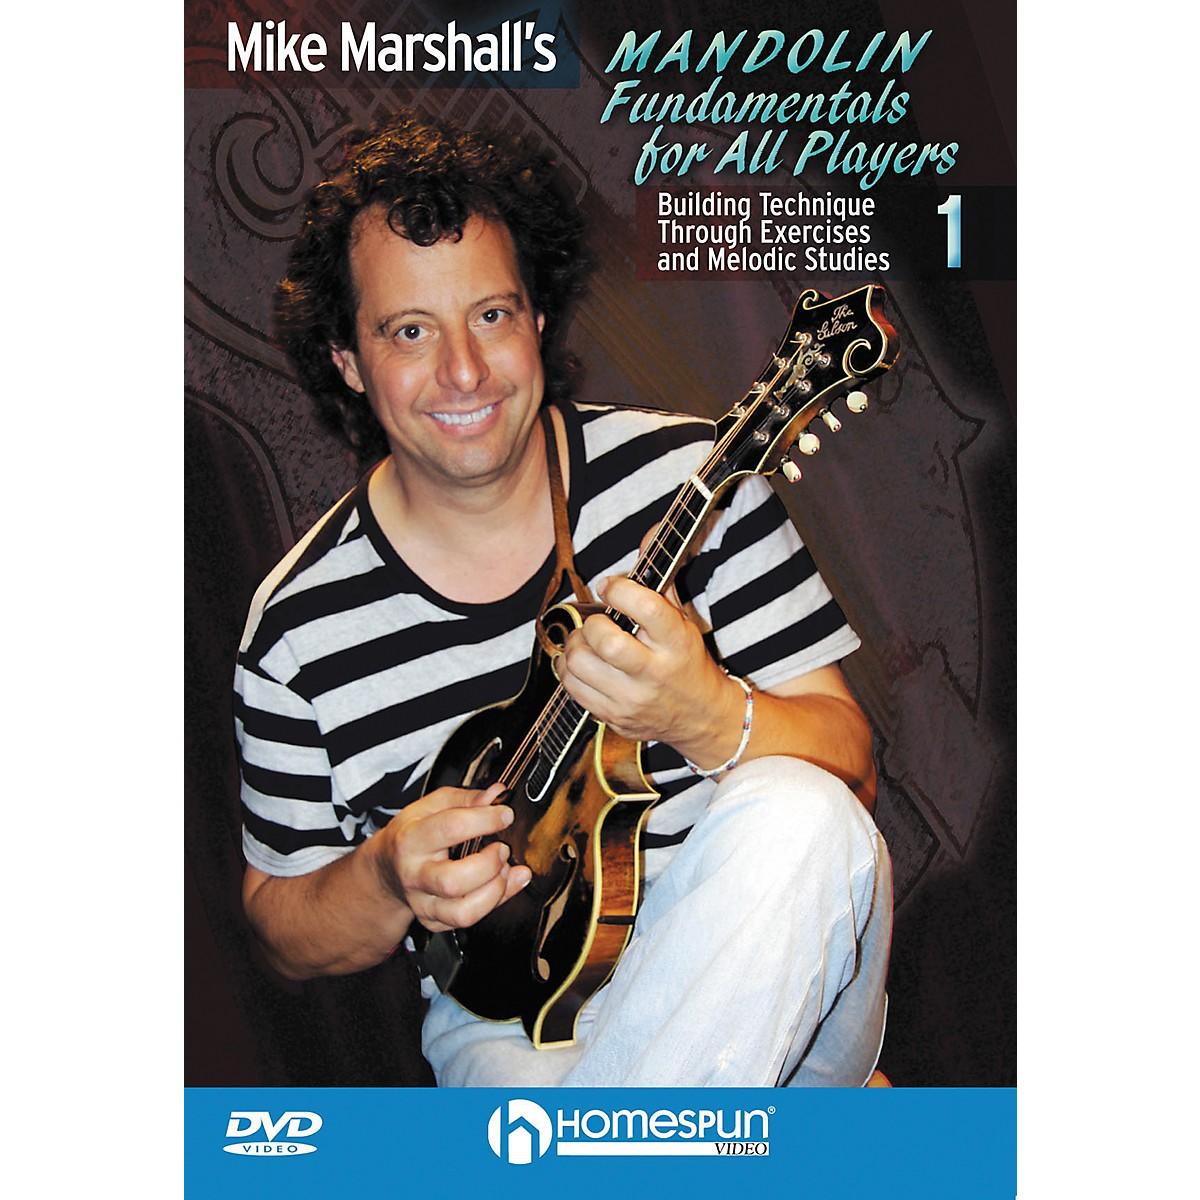 Homespun Mike Marshall's Mandolin Fundamentals For All Players DVD 1